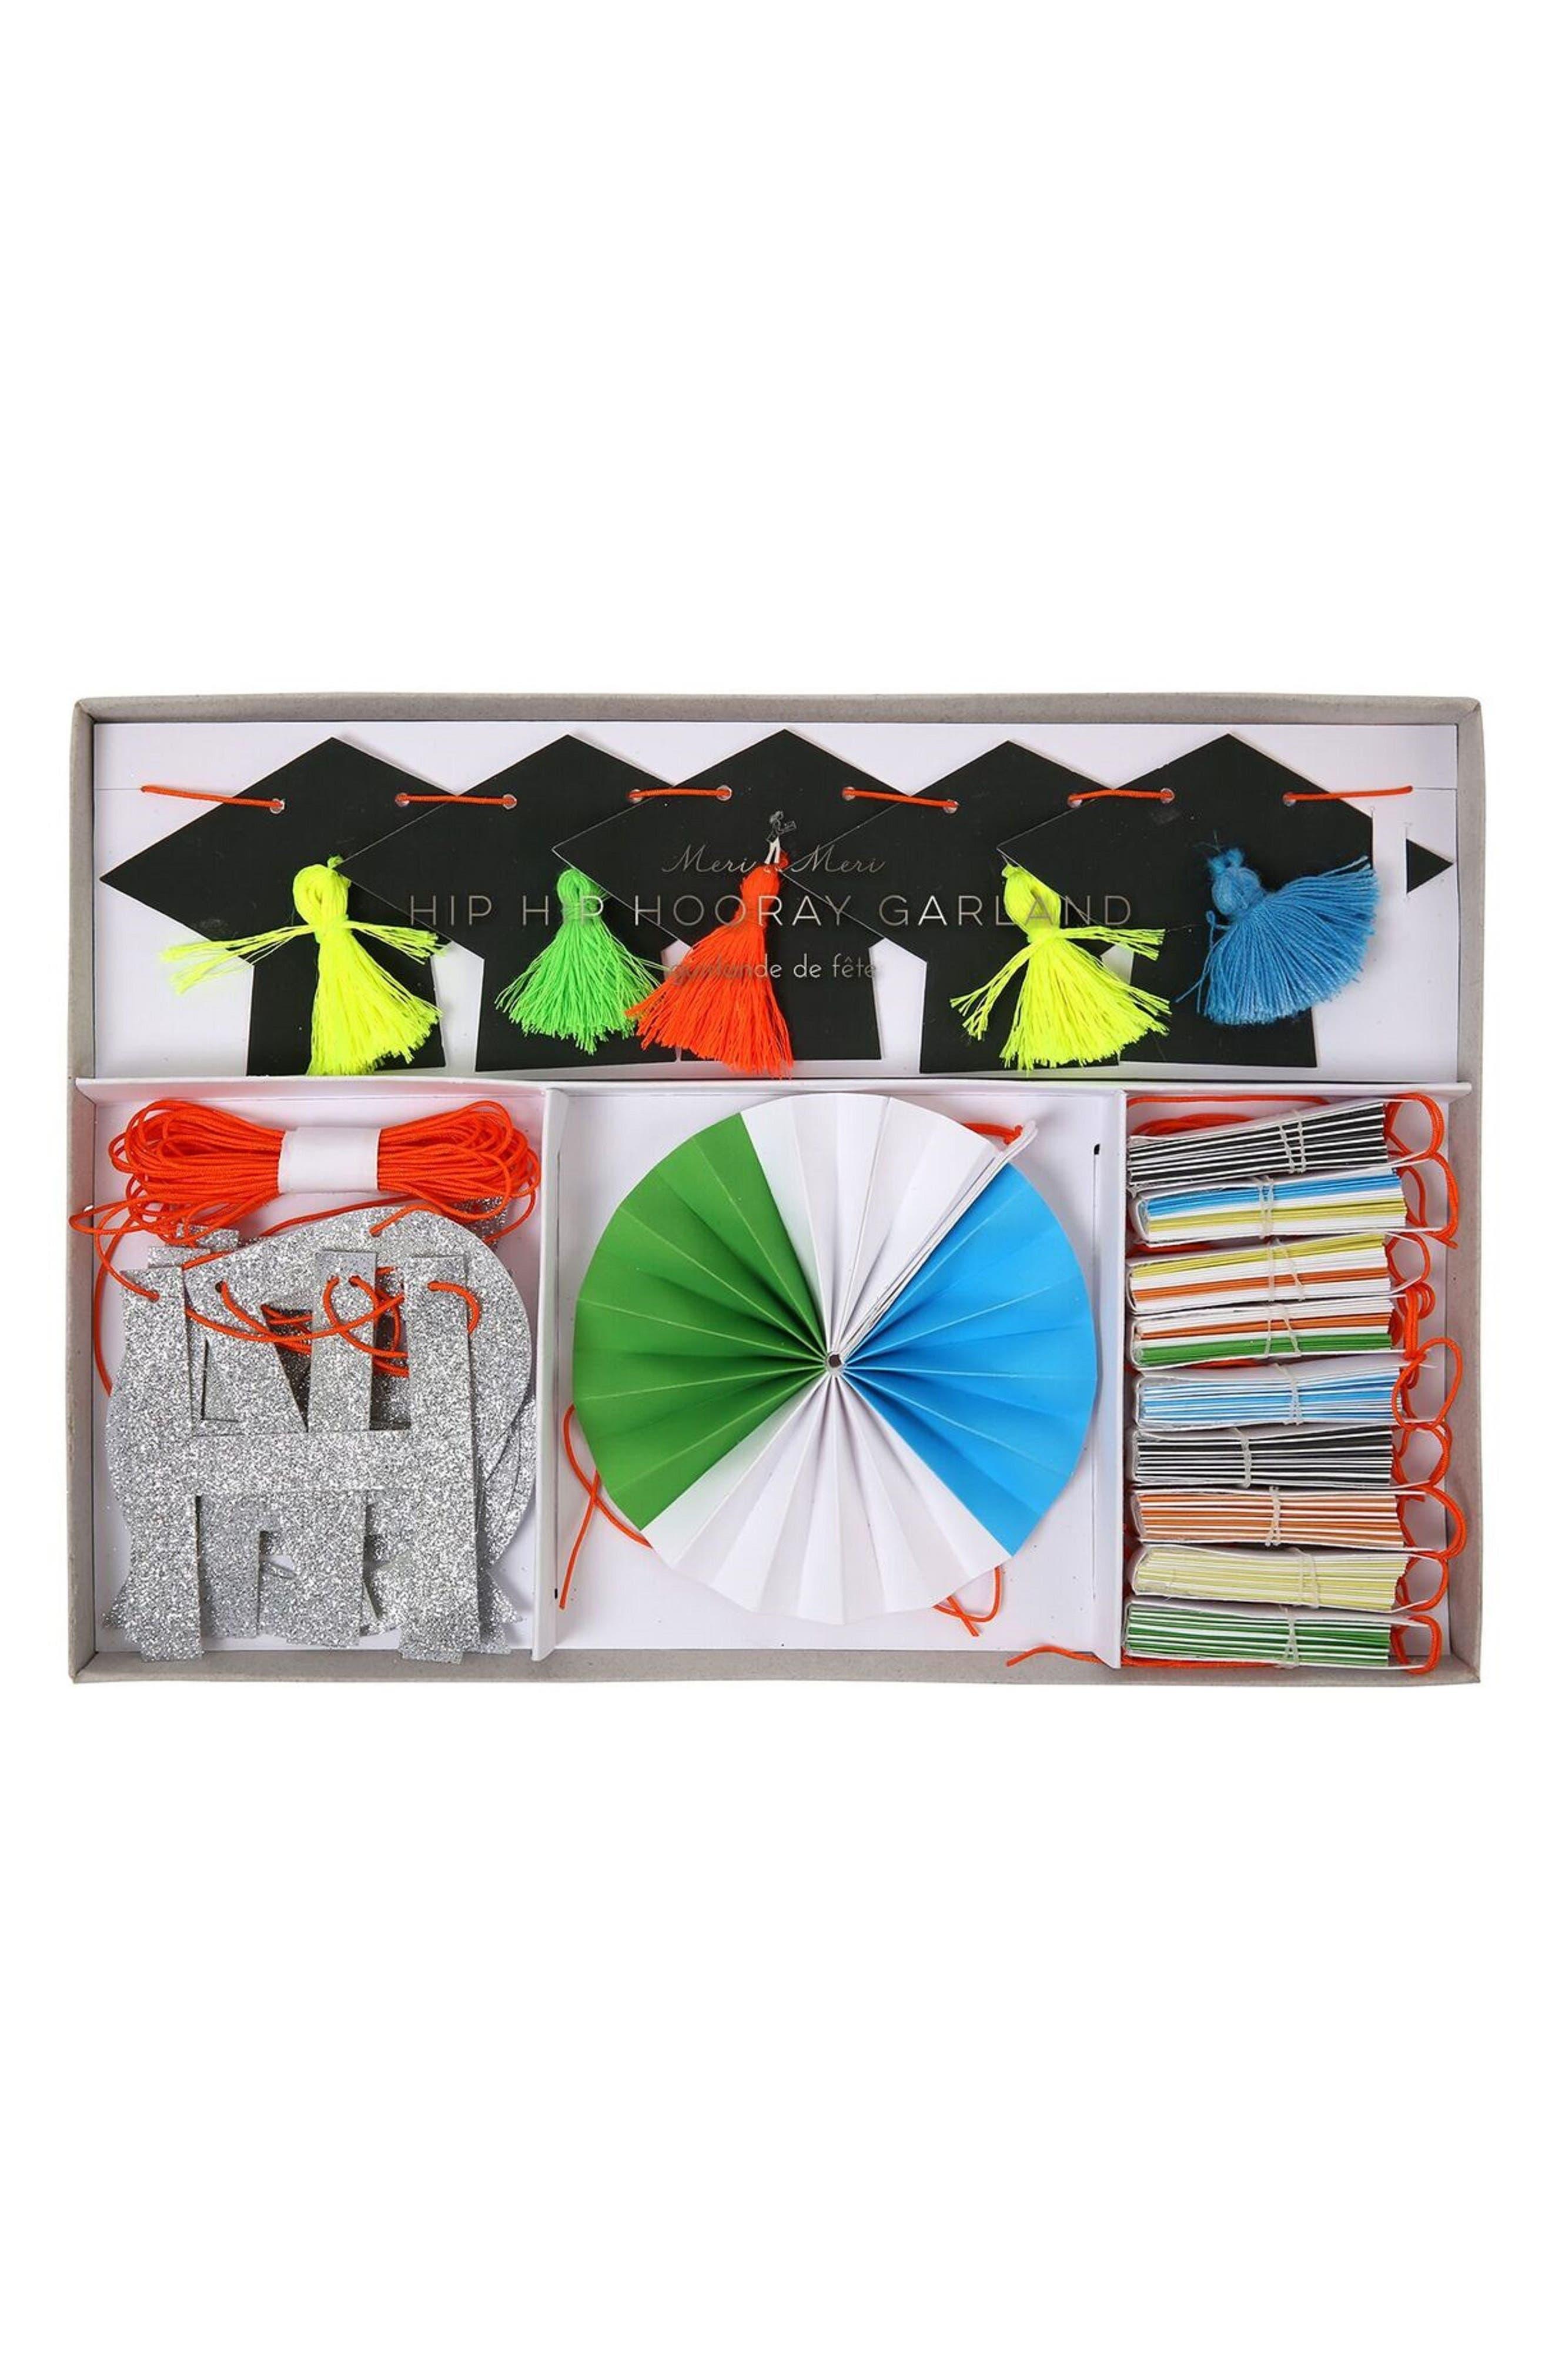 Hip Hip Hooray Graduation Party Garland Kit,                         Main,                         color,